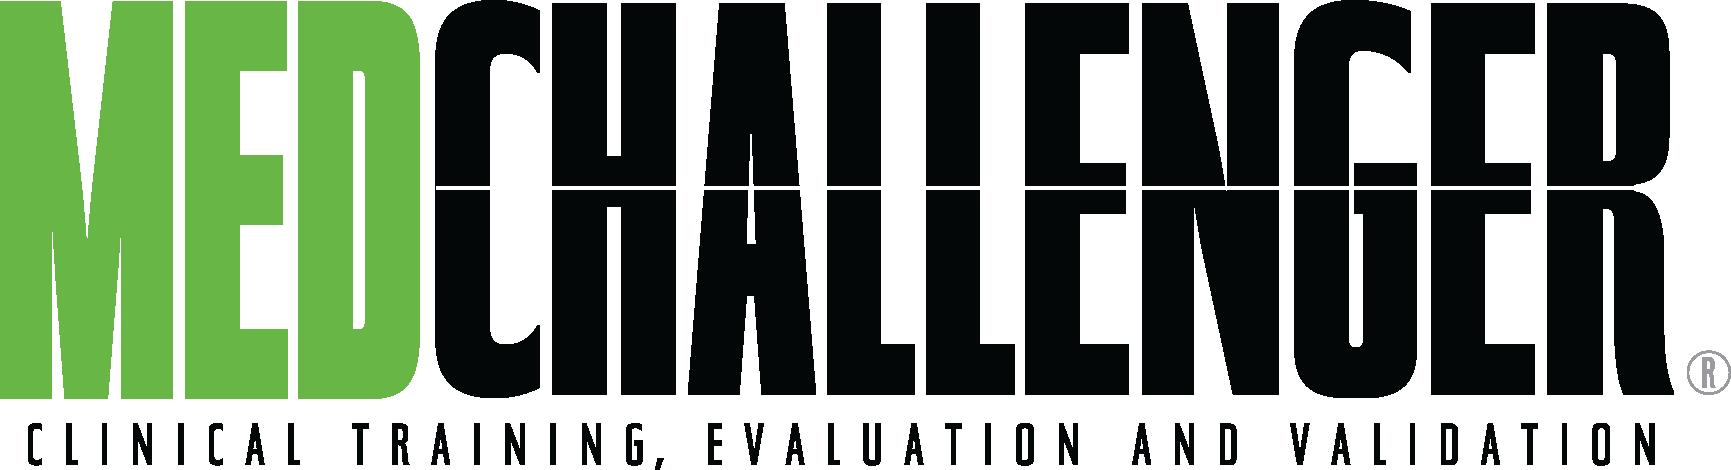 medchallenger-logo